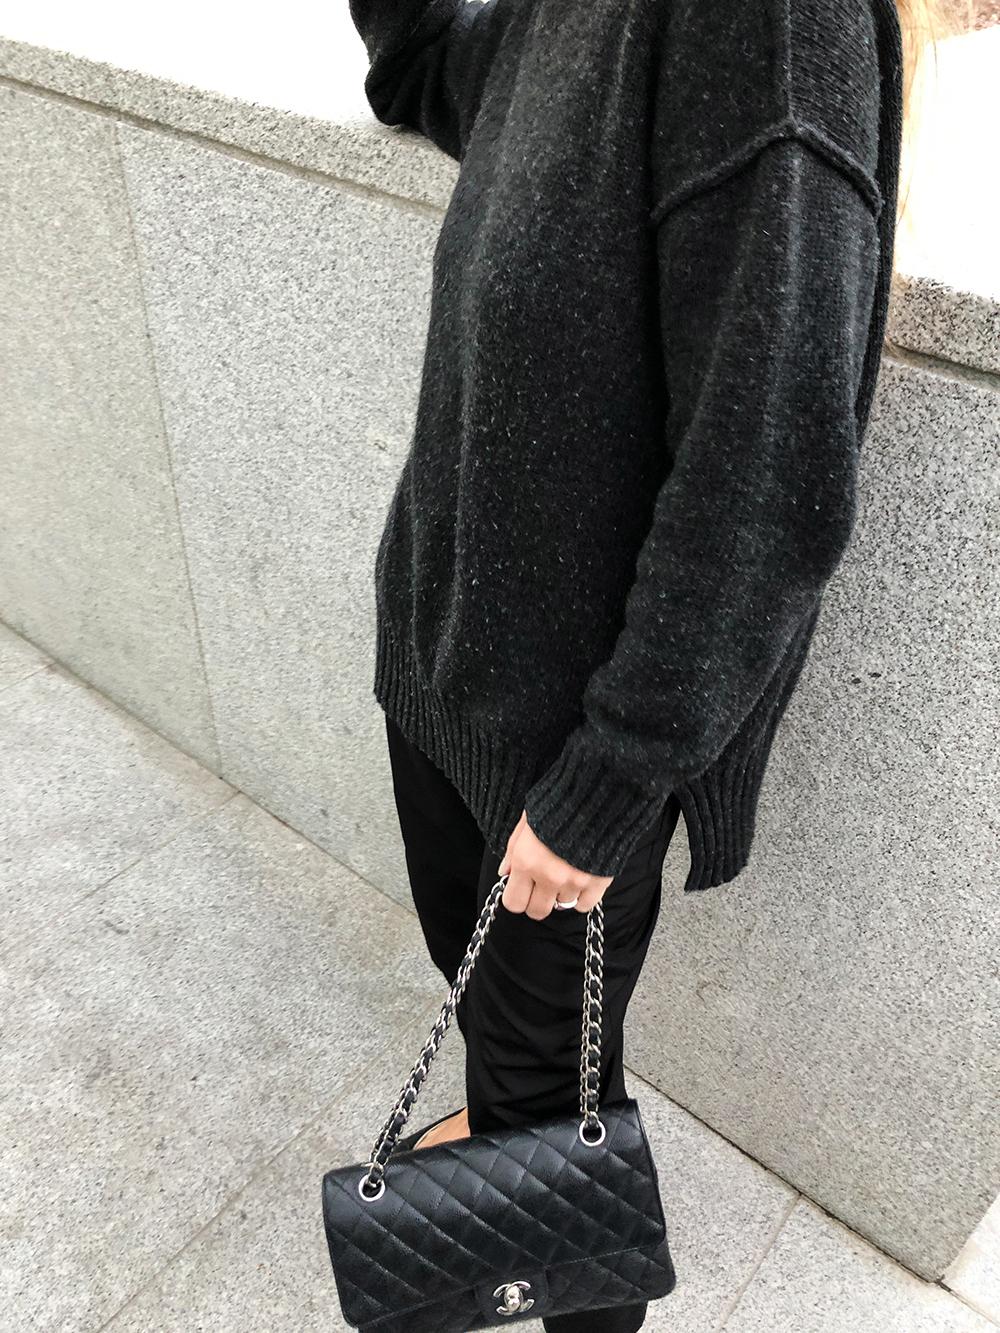 Trini | Chanel bag, Chanel flats